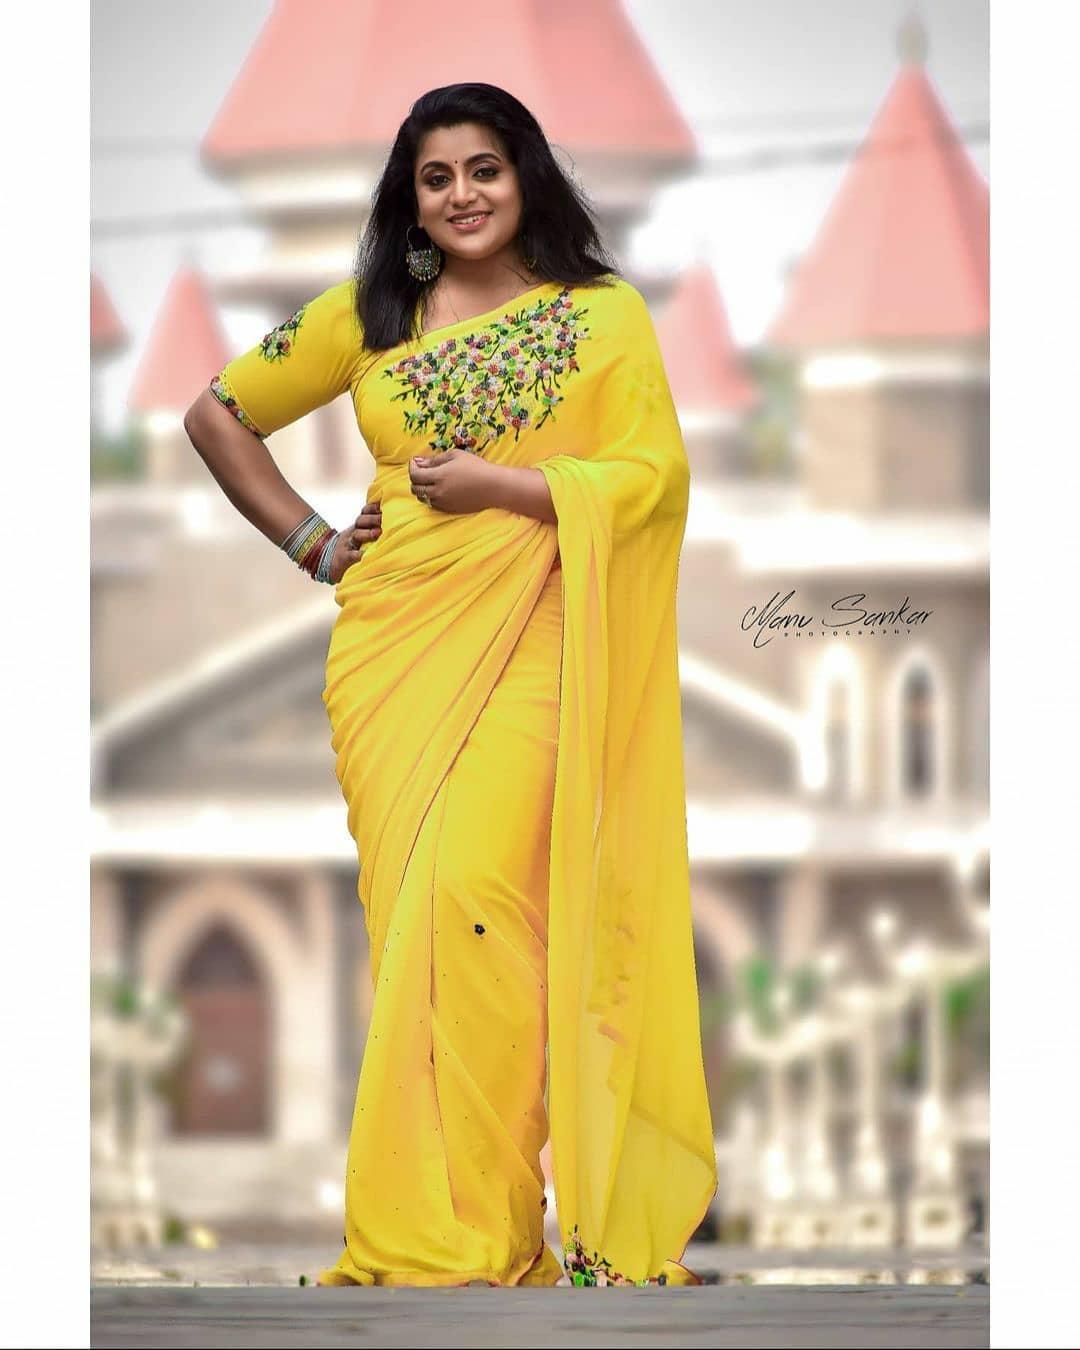 South Indian Actress Veena Nair Looking Beautiful in Yellow Saree !